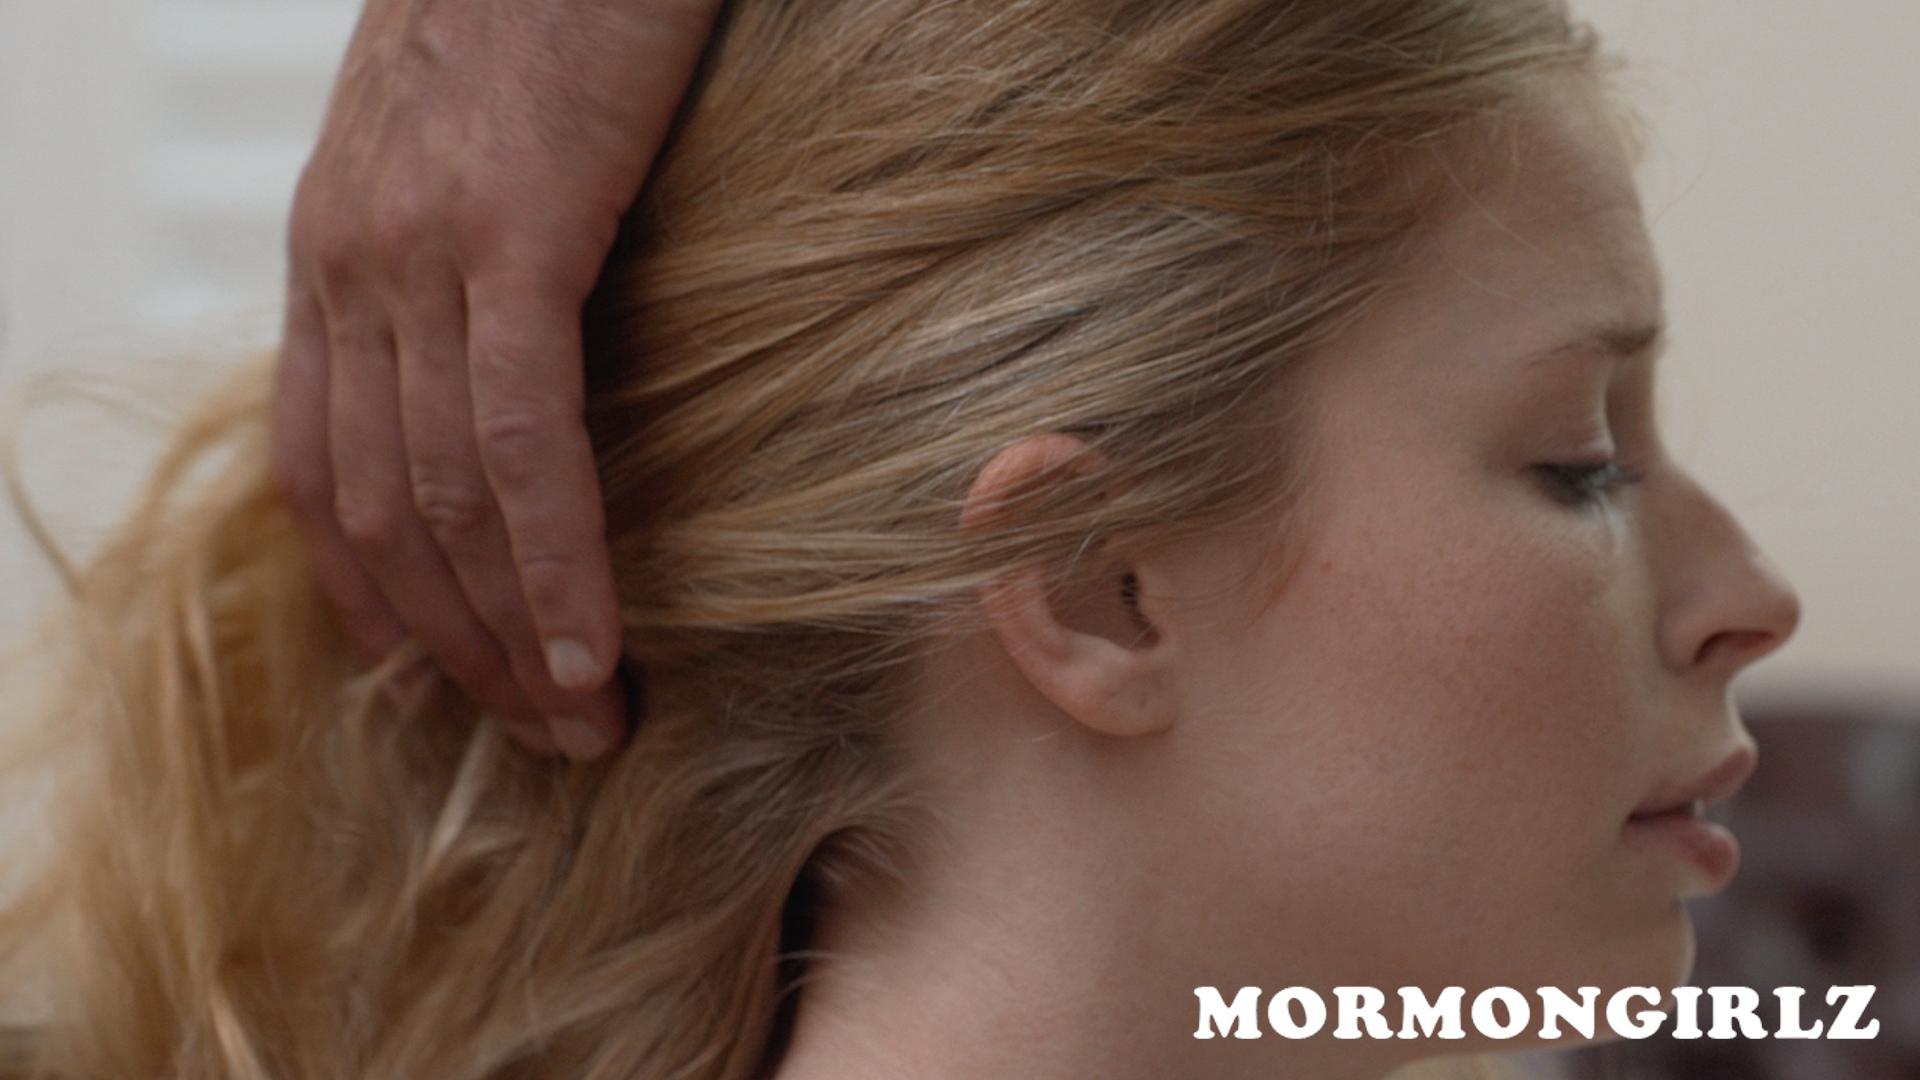 mormongirlz_70b_13